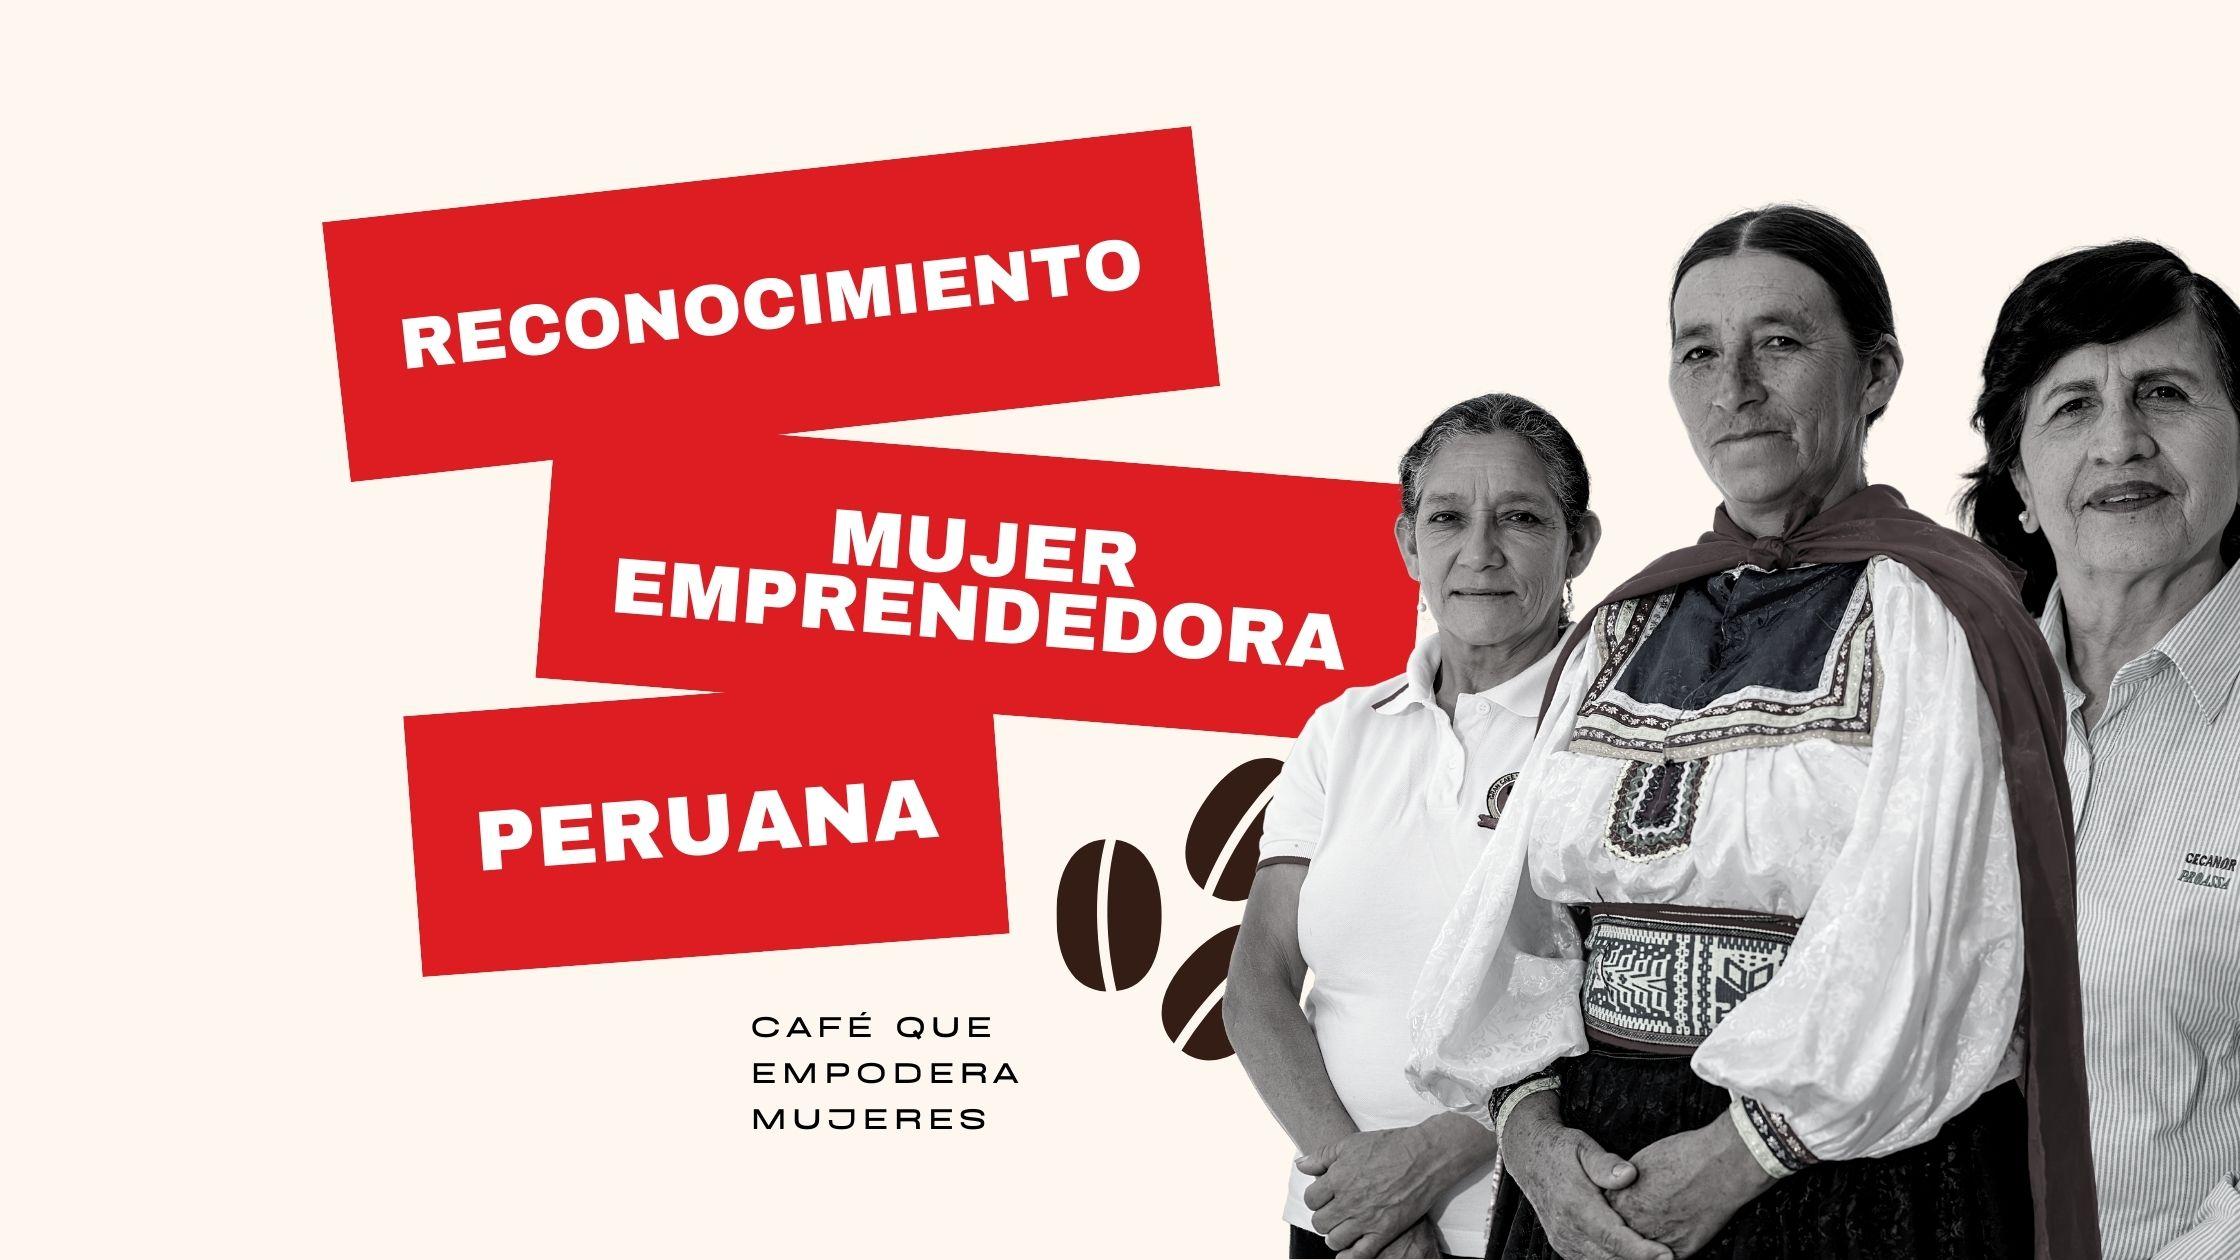 mujer emprendedora peruana